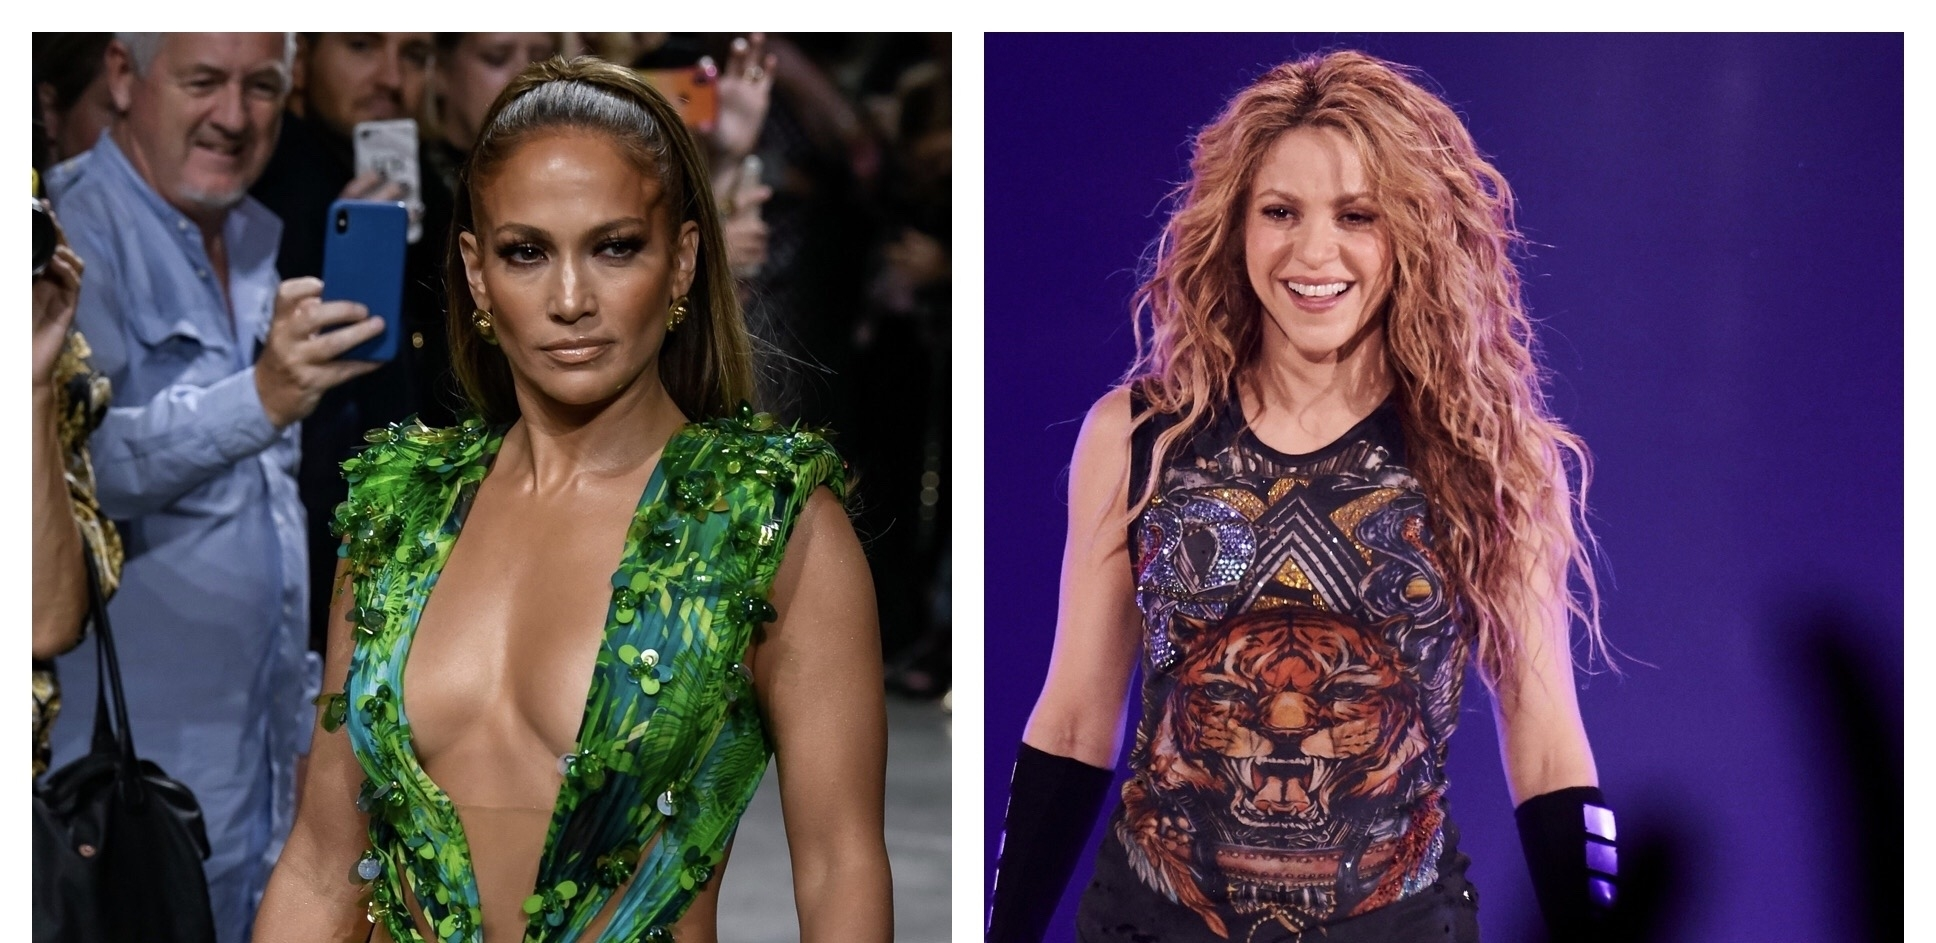 Jennifer Lopez & Shakira To Perform At 2020 Super Bowl intended for Super Bowl Halftime Show 2020